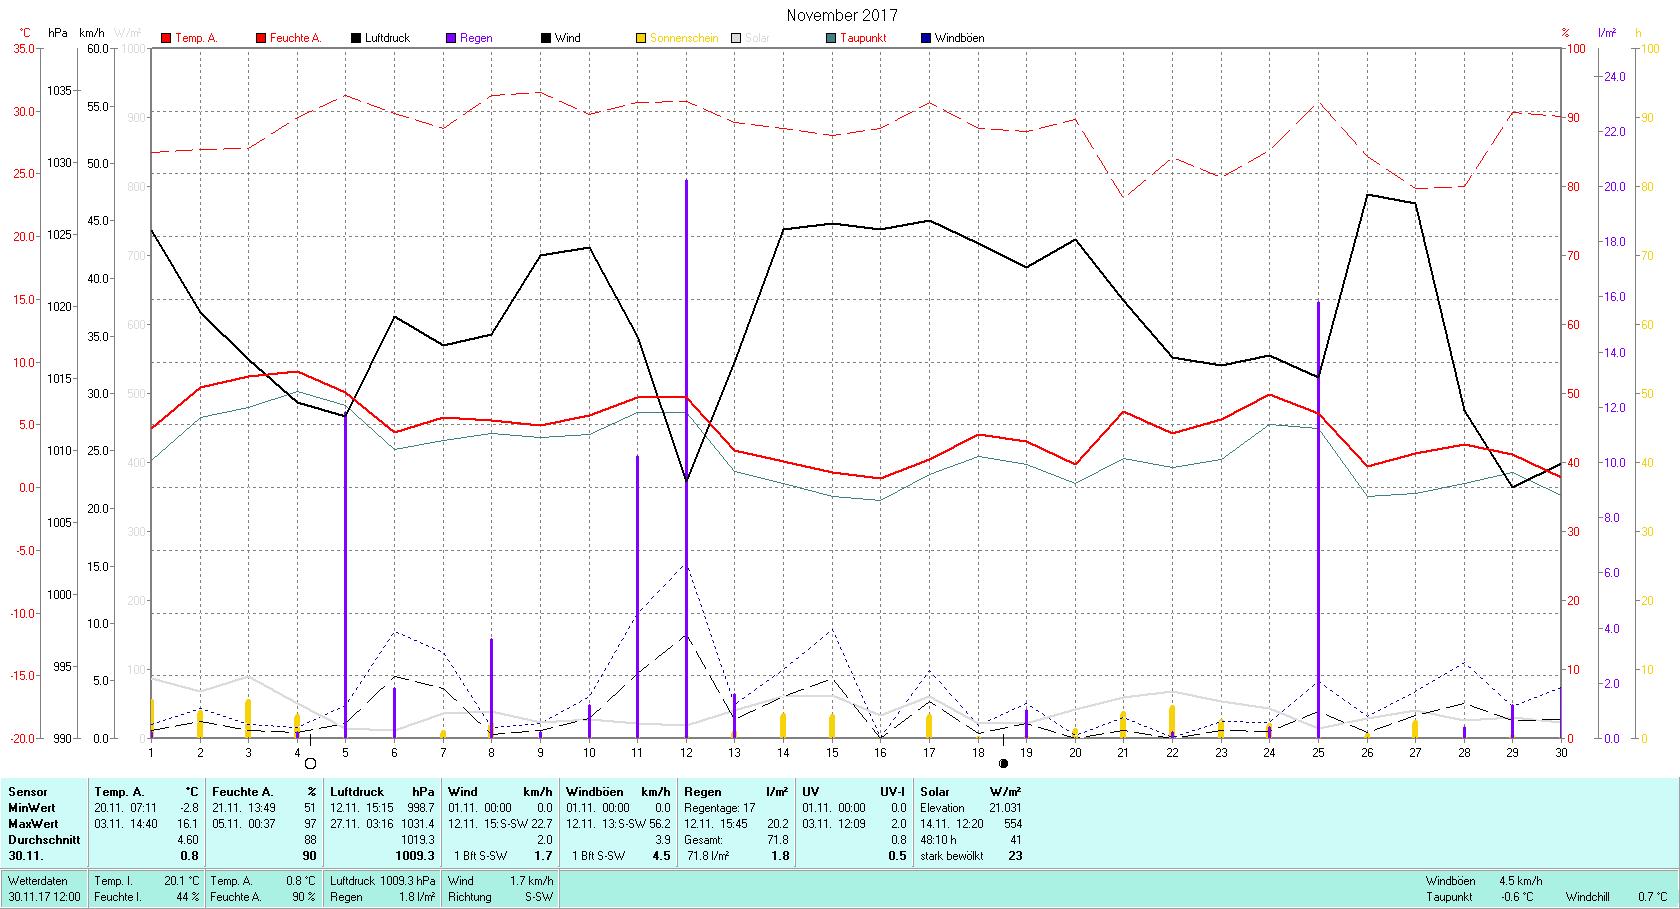 November 2017 Tmin -2.8°C, Tmax 16.1°C, Sonne 48:10 h, Niederschlag 71.8mm/2